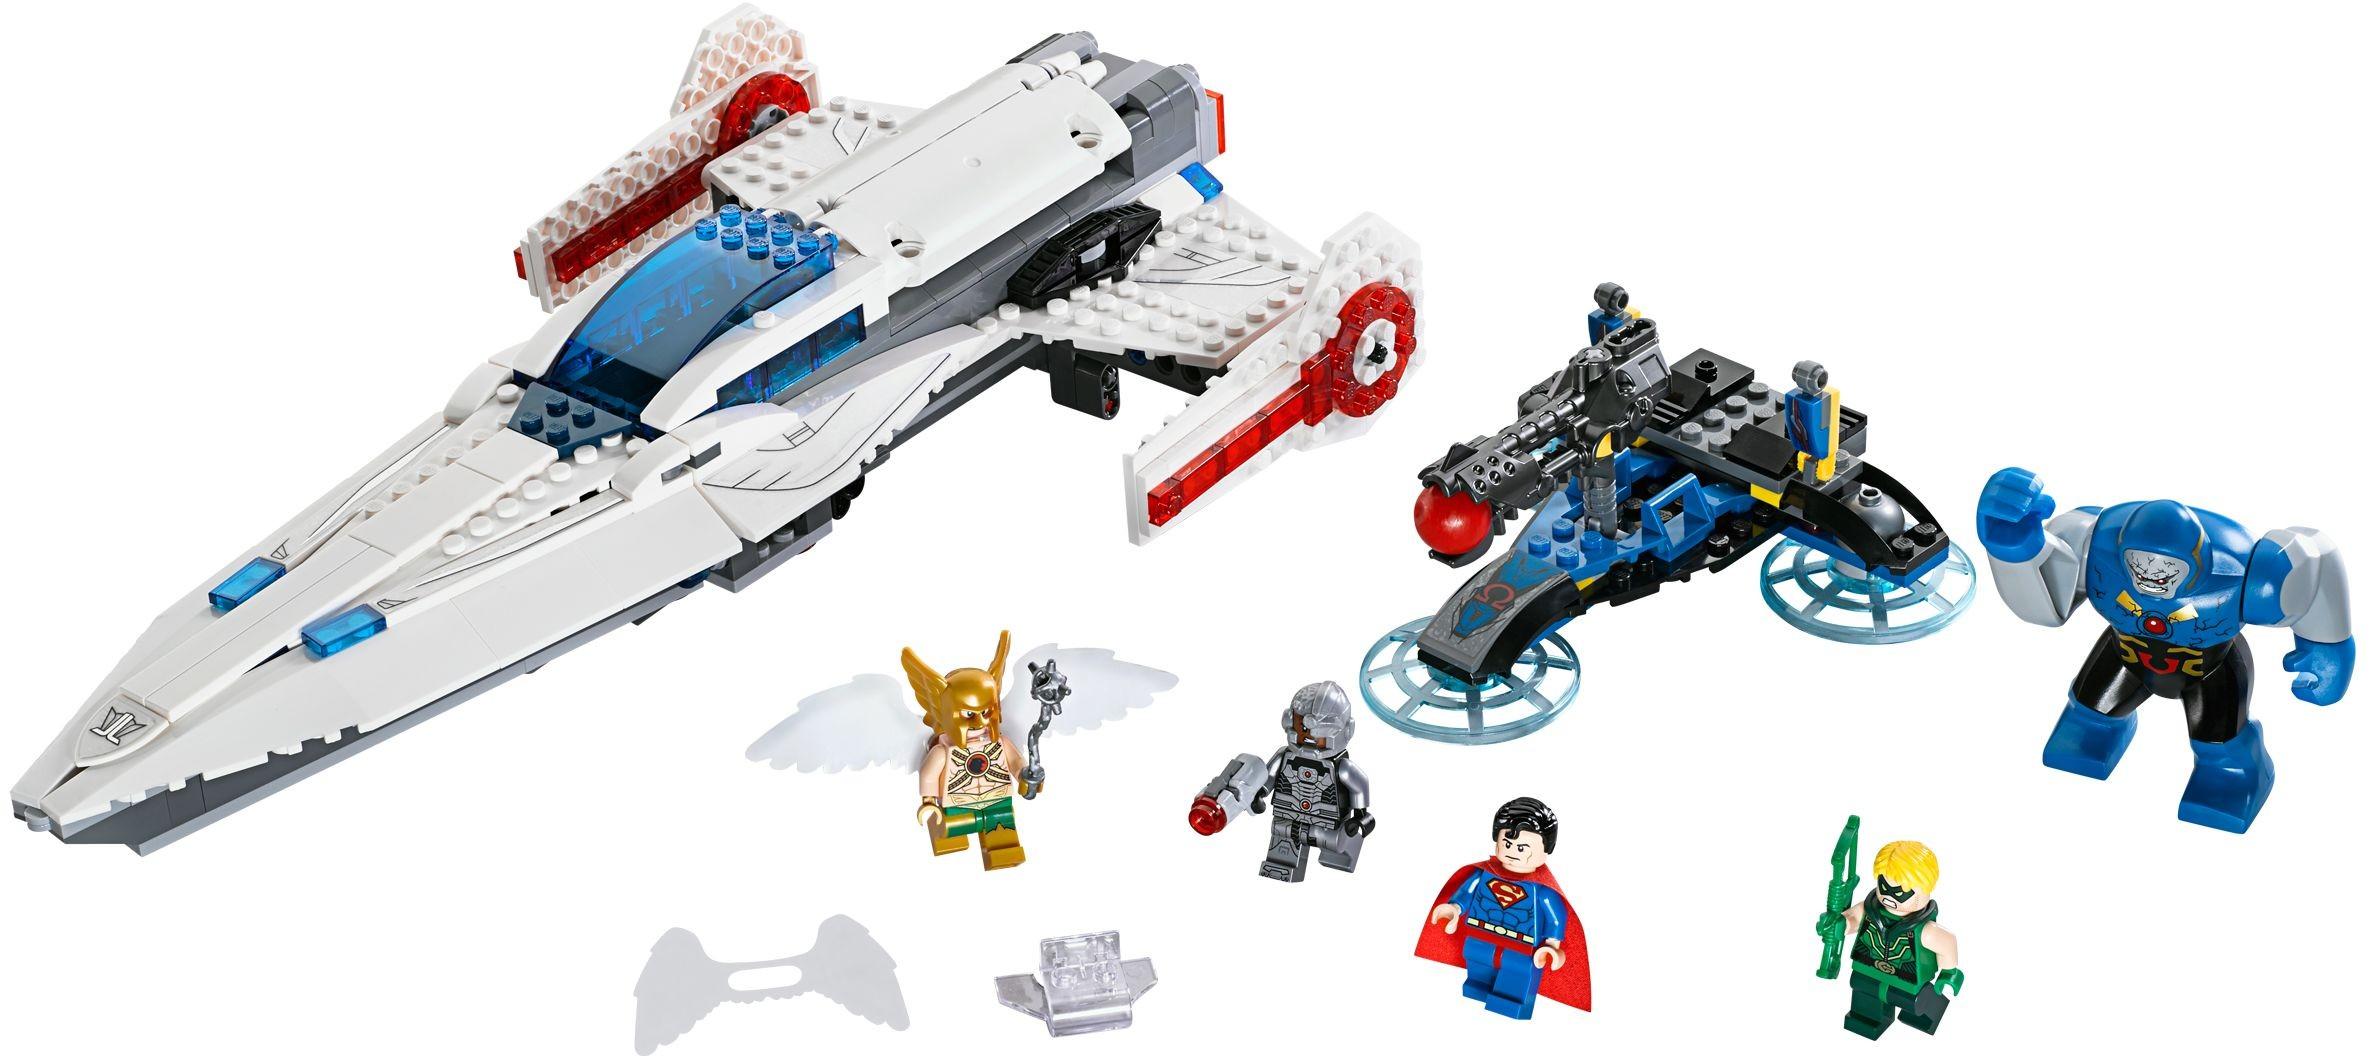 6 in 1 Action Team Combaticons Super Hero Robot Model Building Block Toys 506pcs